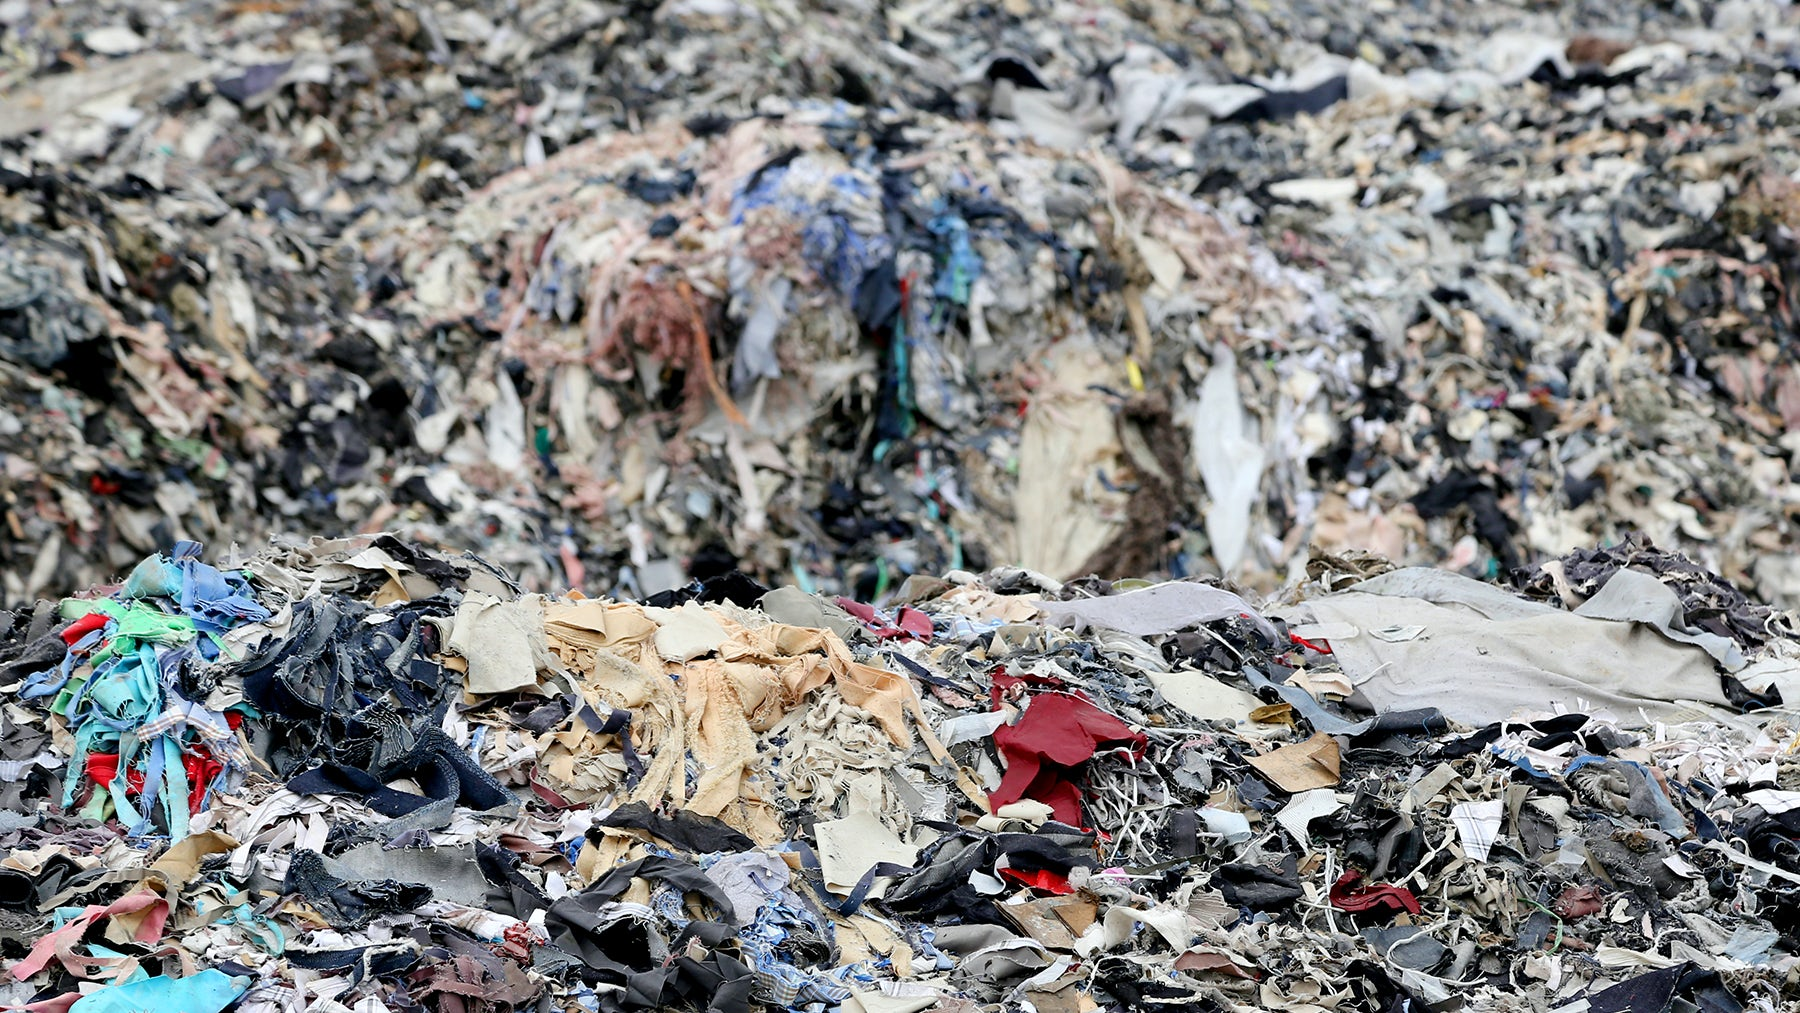 Textile waste   Source: Shutterstock